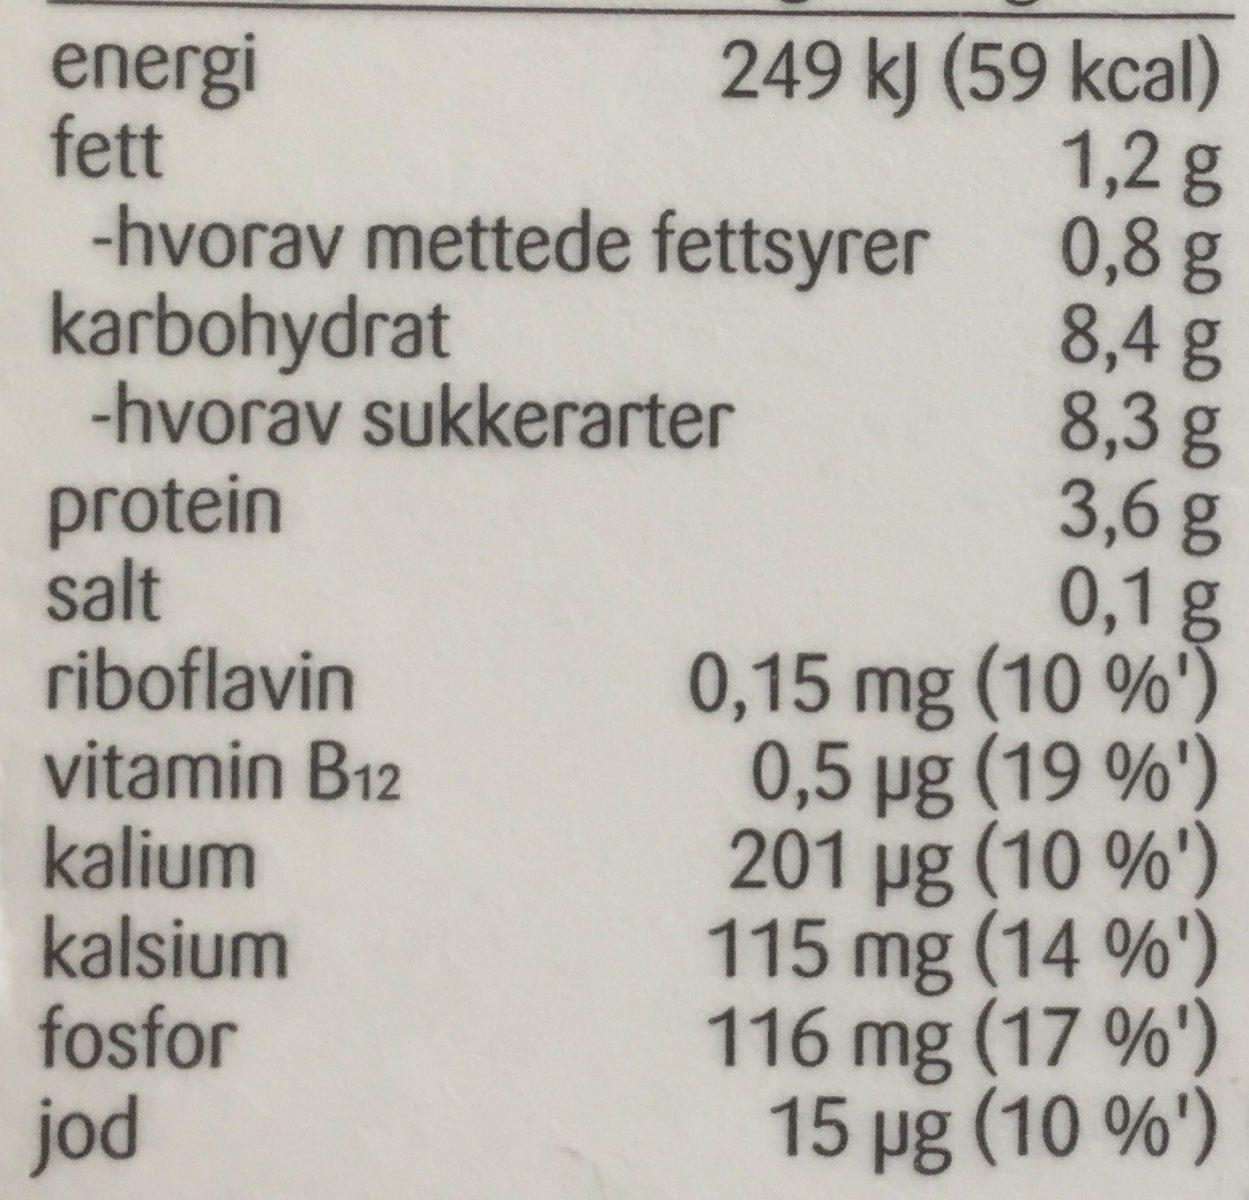 Litago original sjokolademelk - Nutrition facts